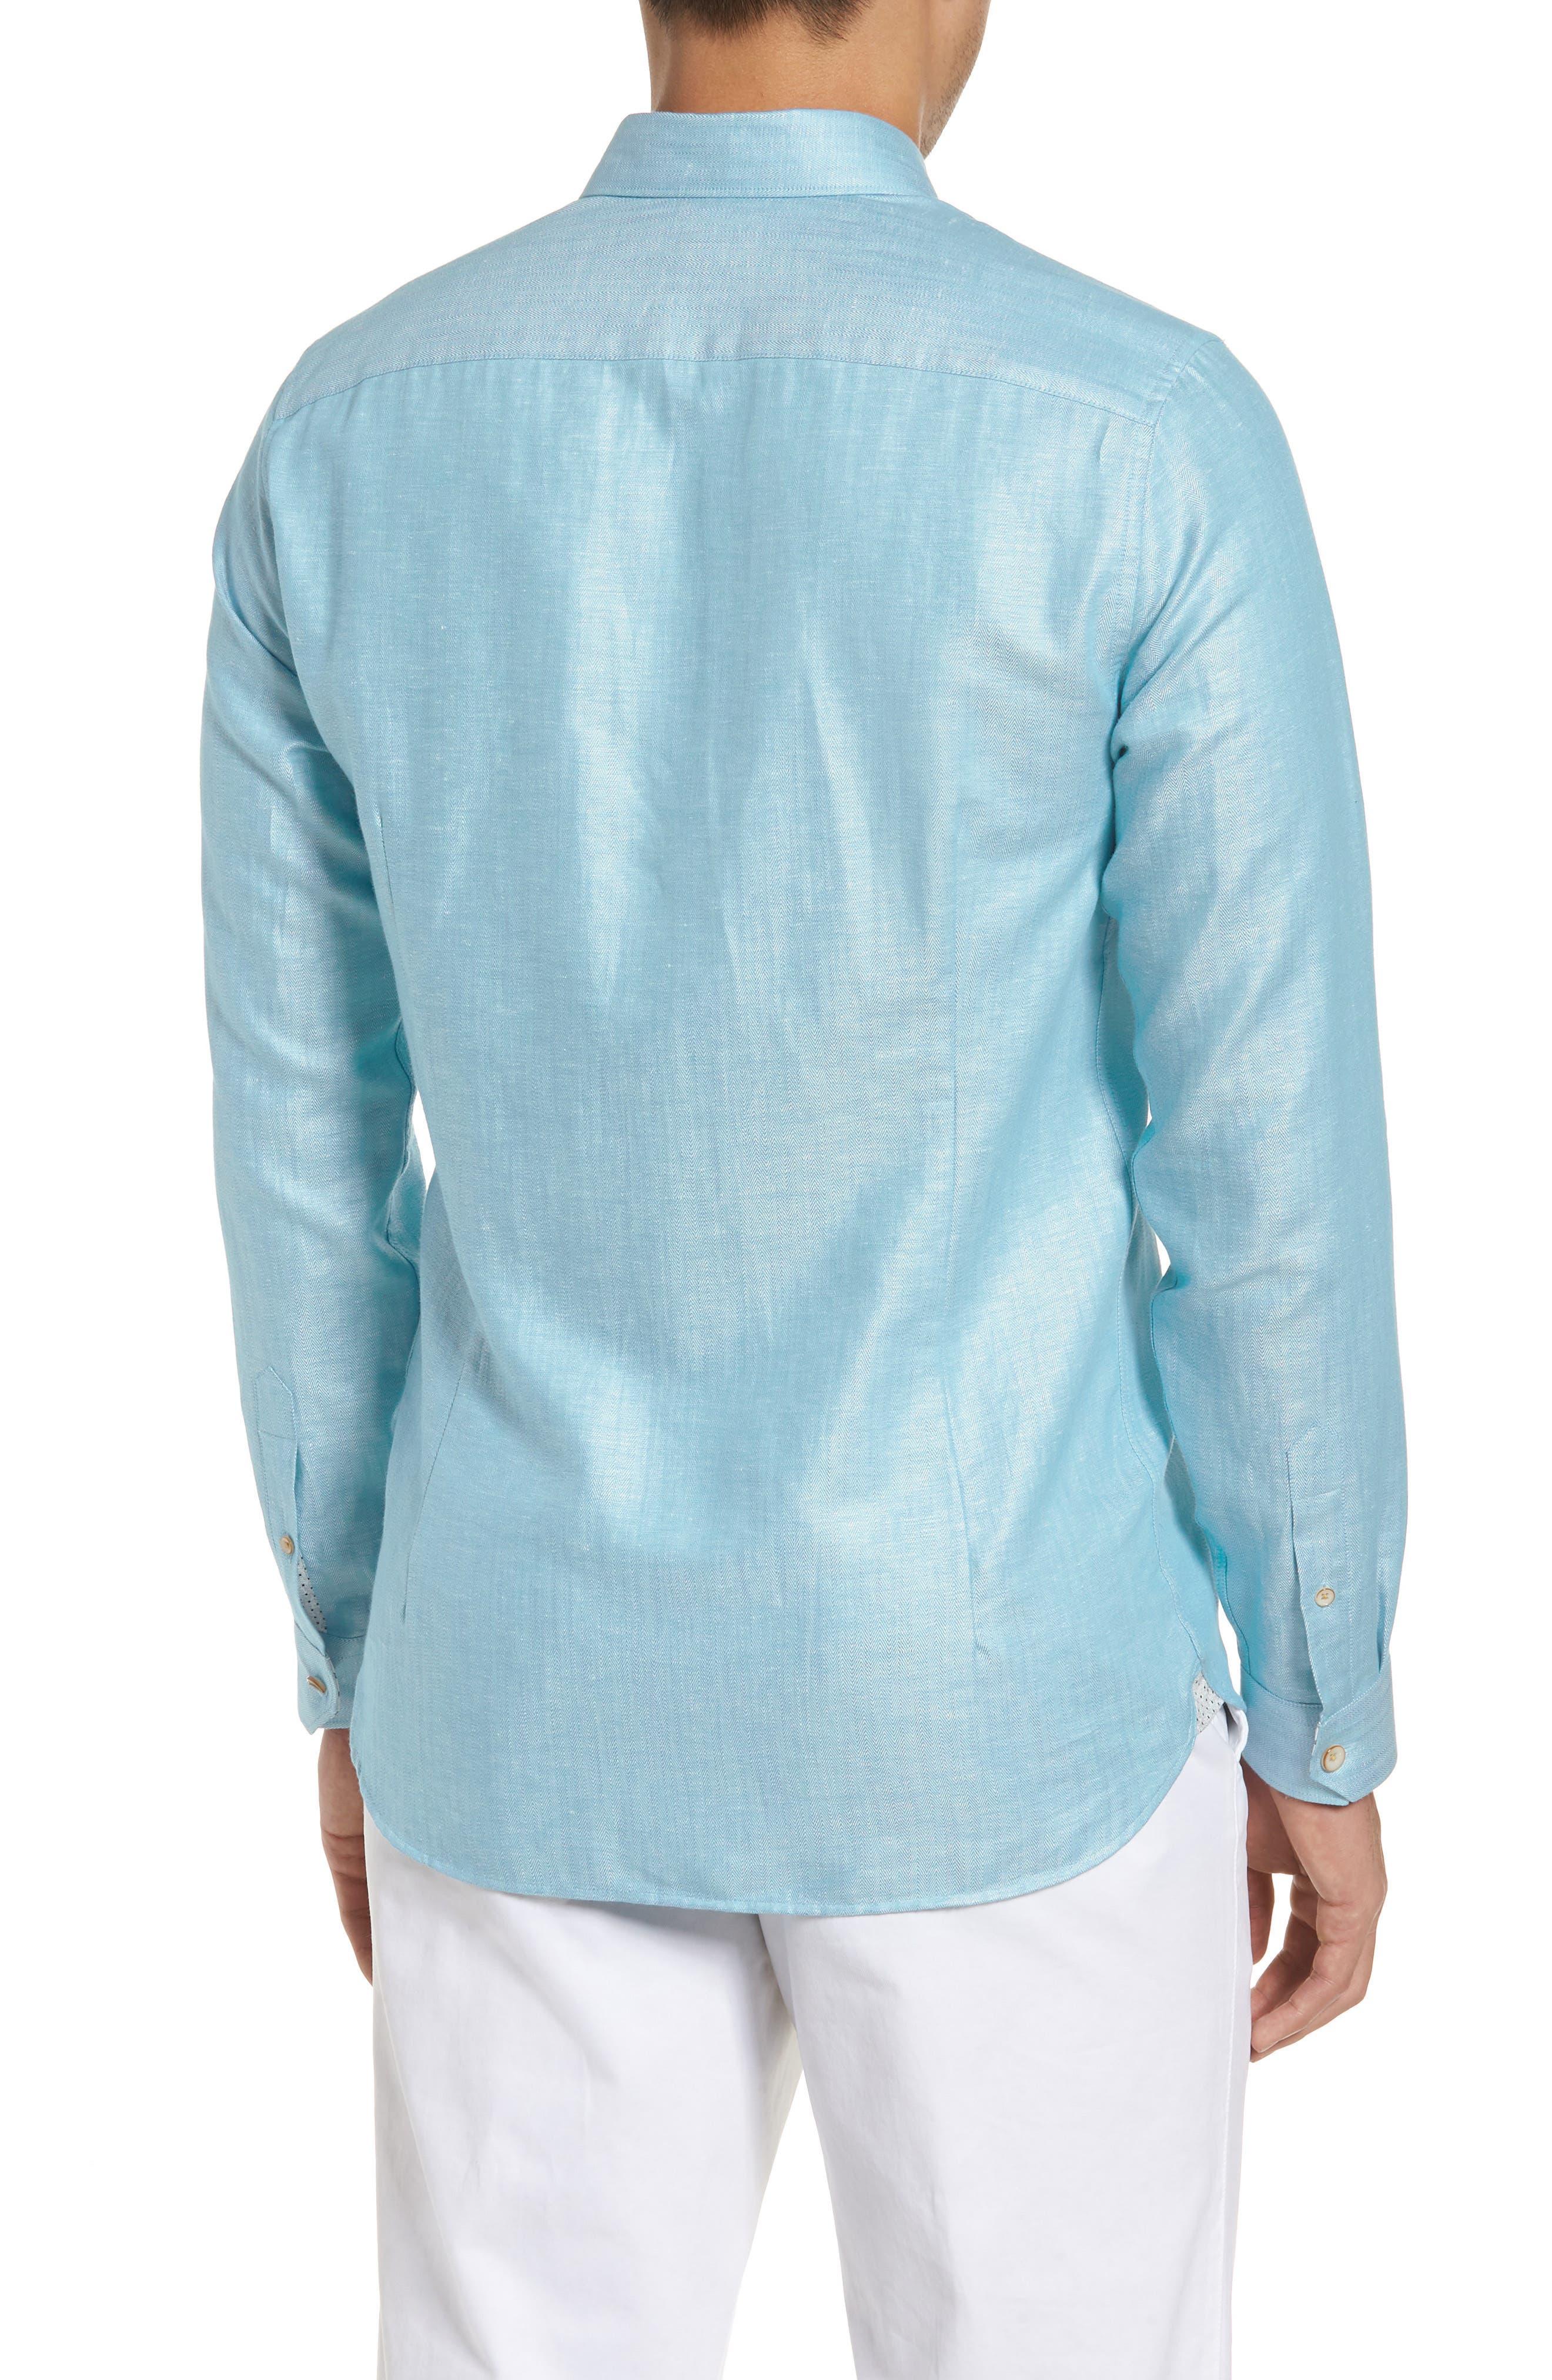 Linlins Herringbone Cotton & Linen Sport Shirt,                             Alternate thumbnail 9, color,